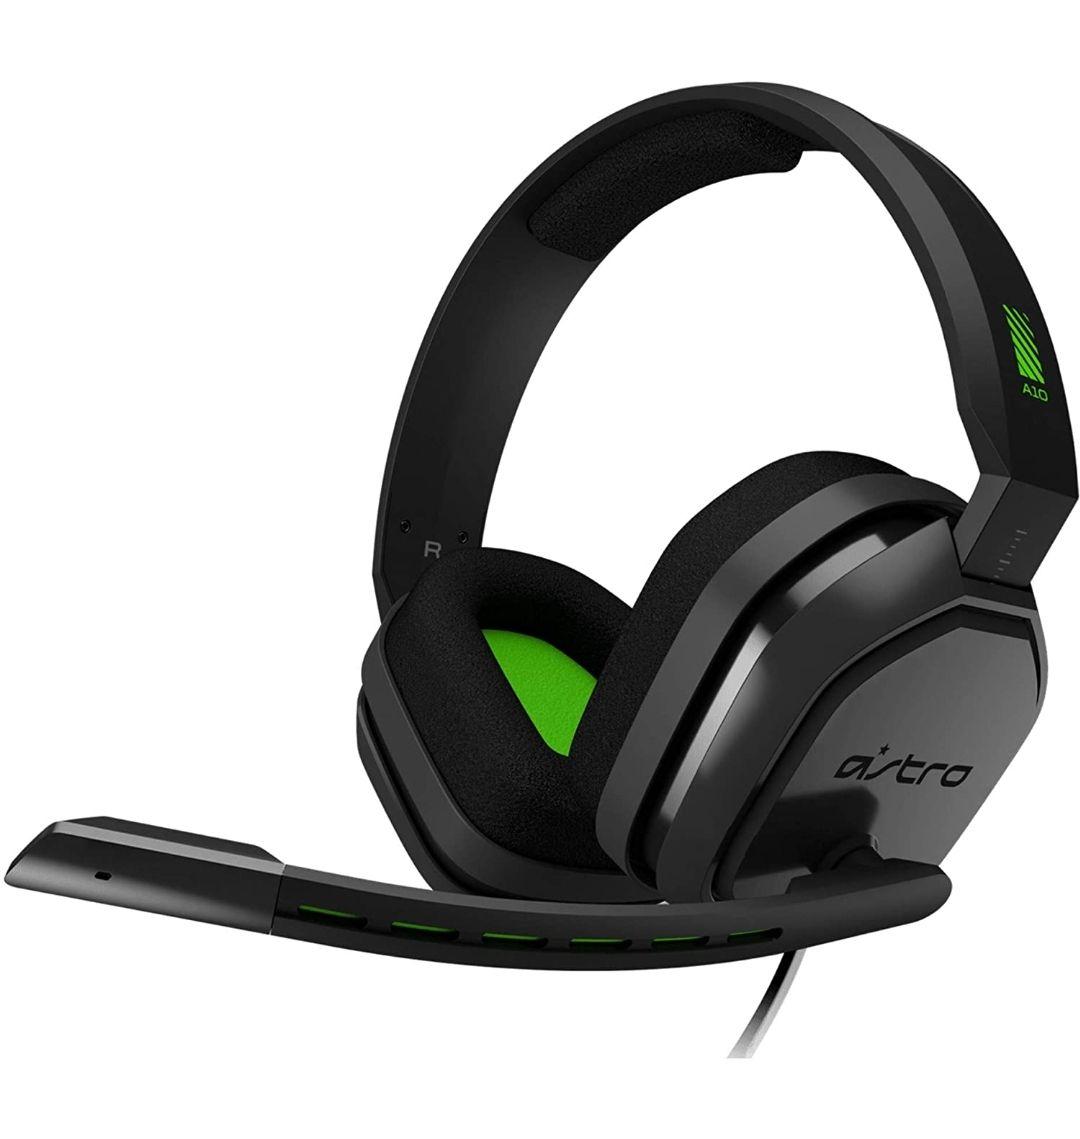 Astro Gaming Headset A10 — Amazon (Prime) WHD wie neu, noch >150 Stk verfügbar